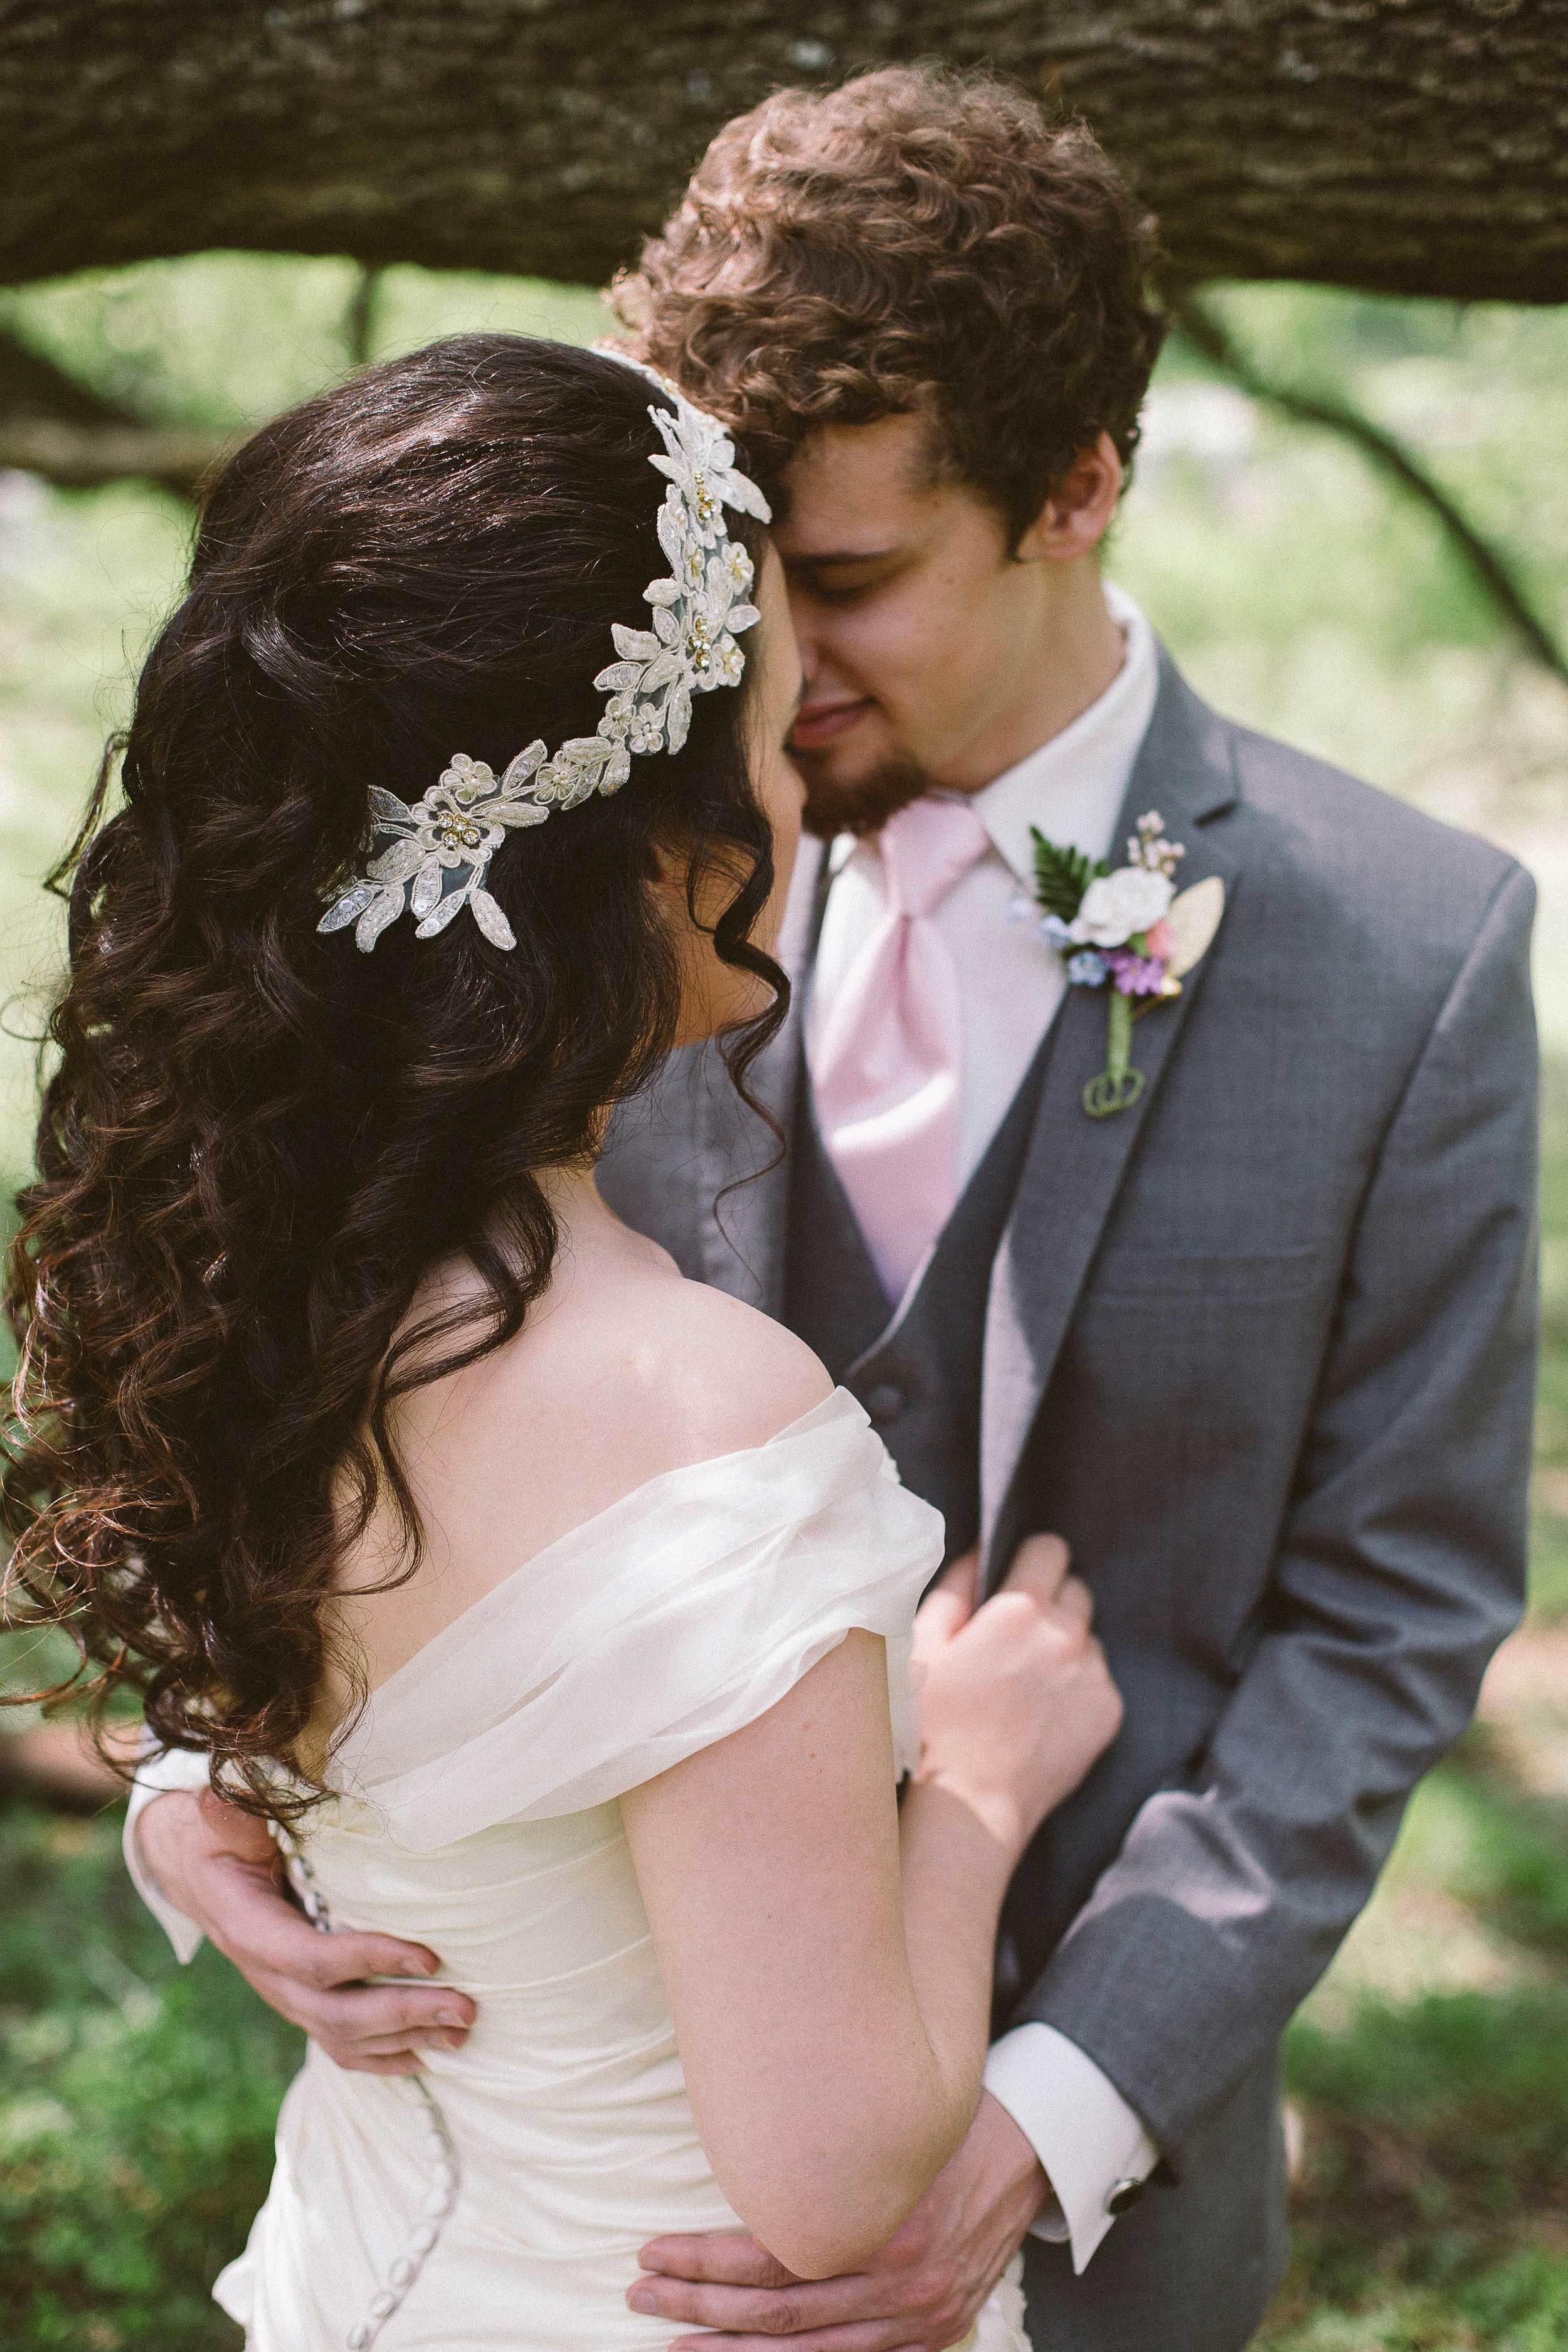 Radka-Wedding-Radka-April-18-2015-0147.jpg